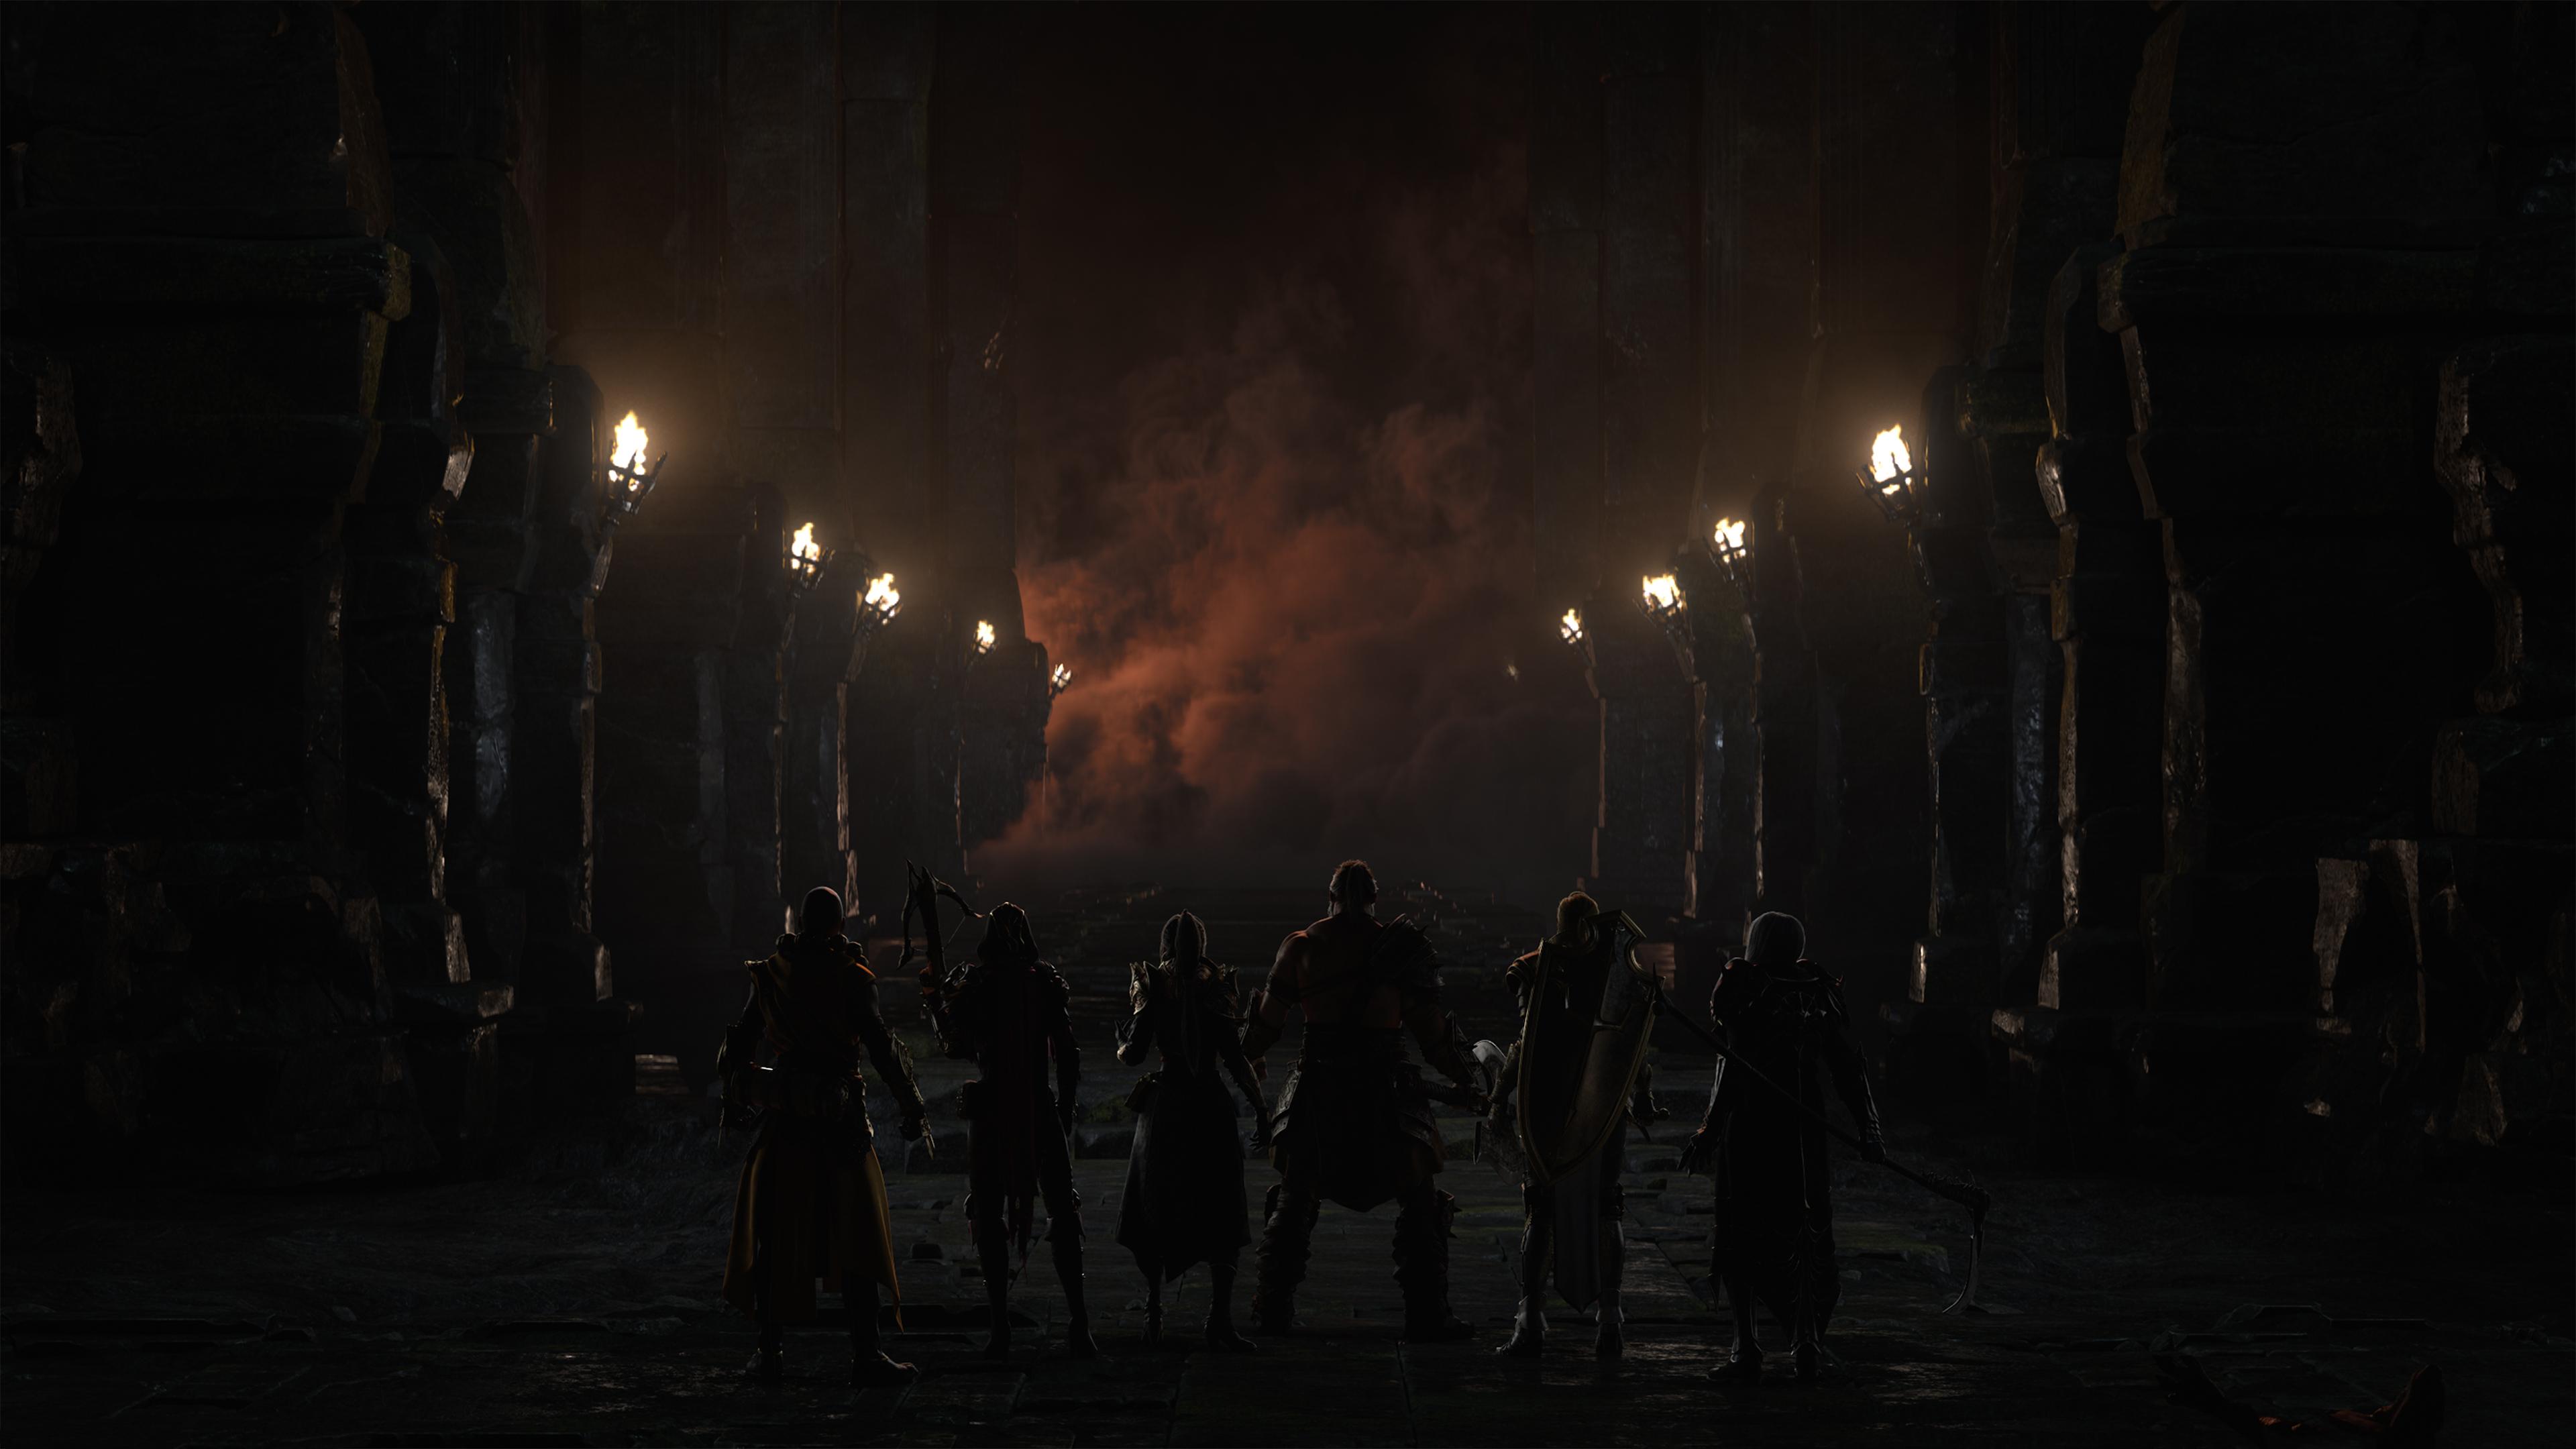 Diablo Immortal Hd Games 4k Wallpapers Images